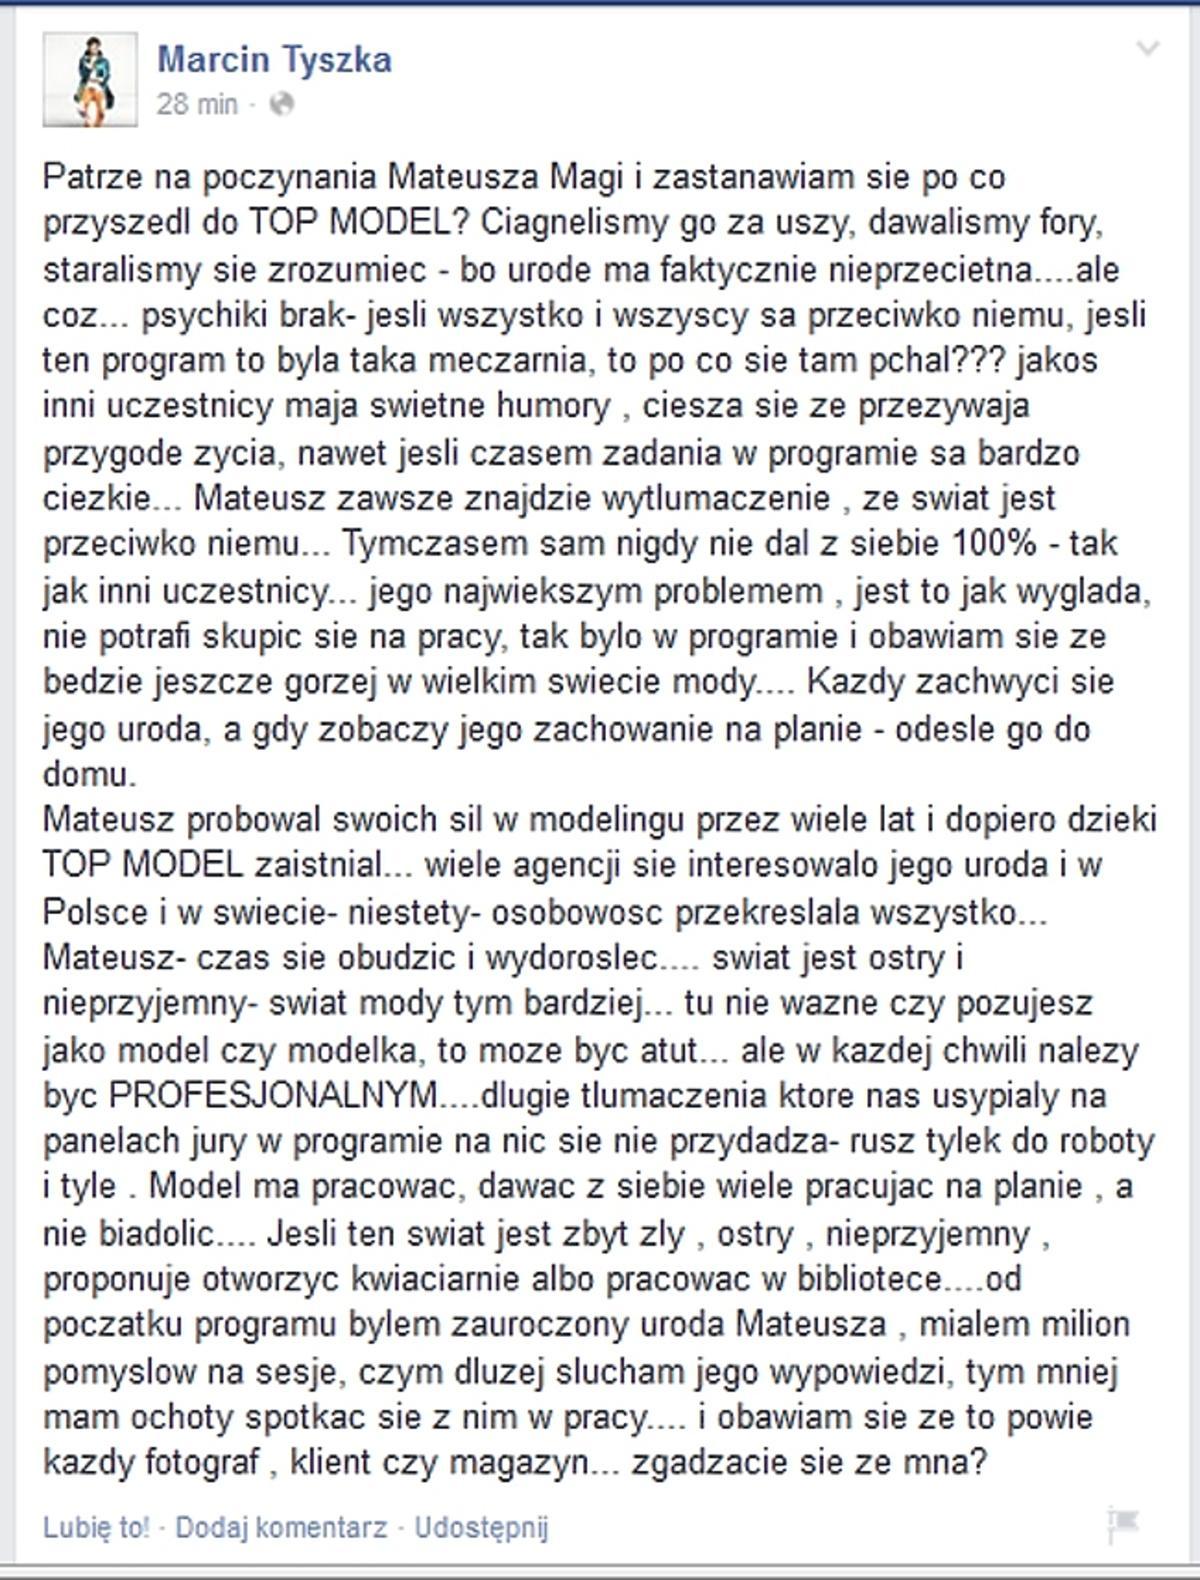 Marcin Tyszka krytykuje Mateusza Magę